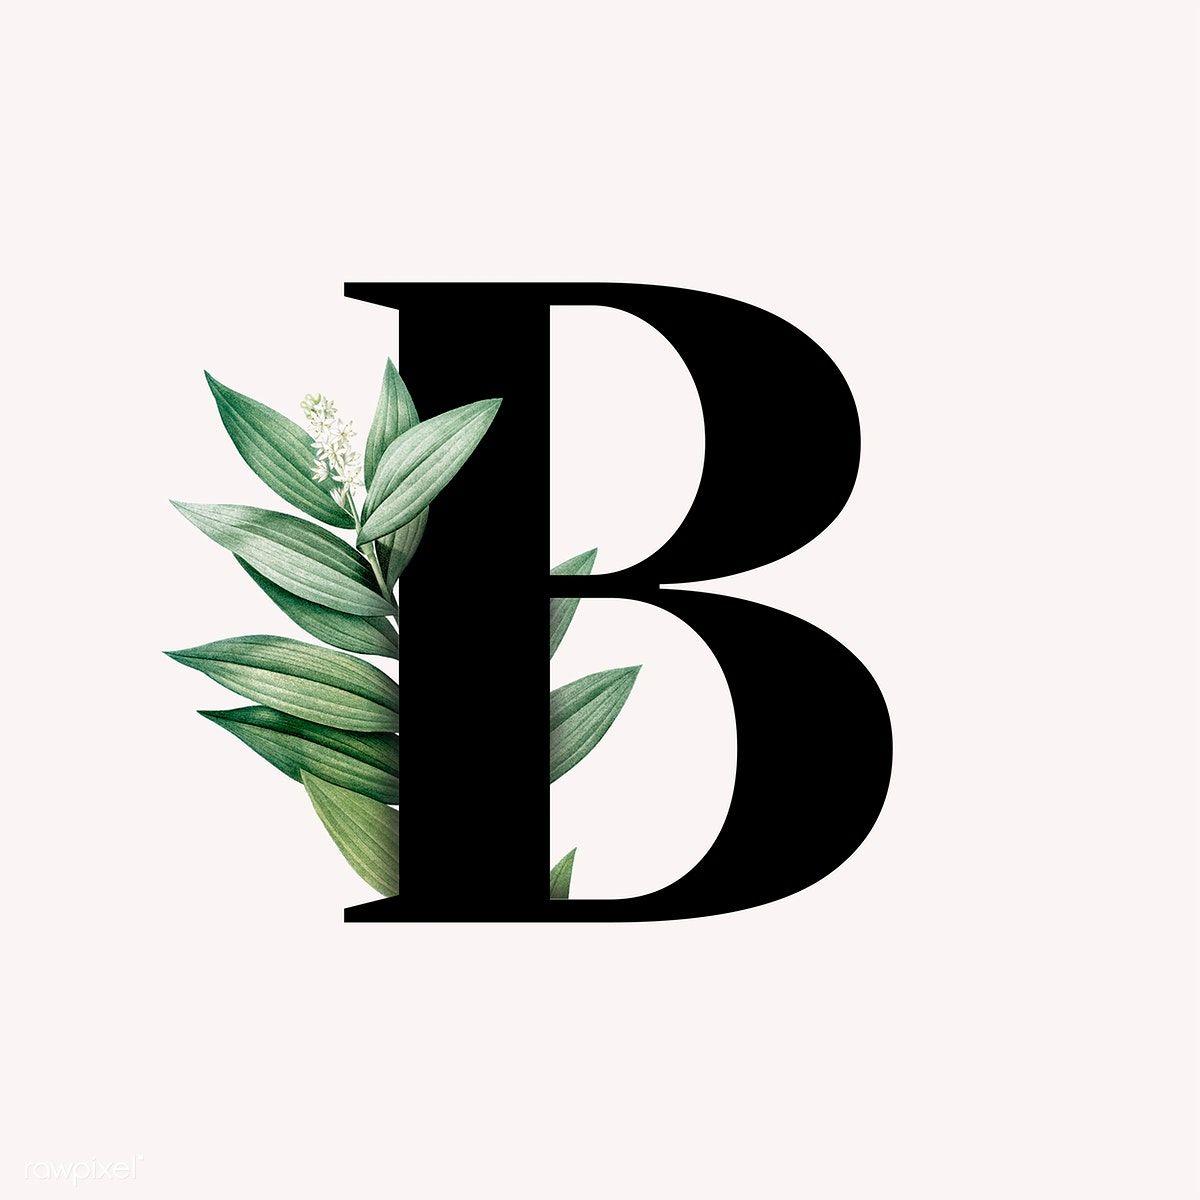 Download Premium Vector Of Botanical Capital Letter B Vector 584847 Letter B Lettering Alphabet Fonts B Letter Design